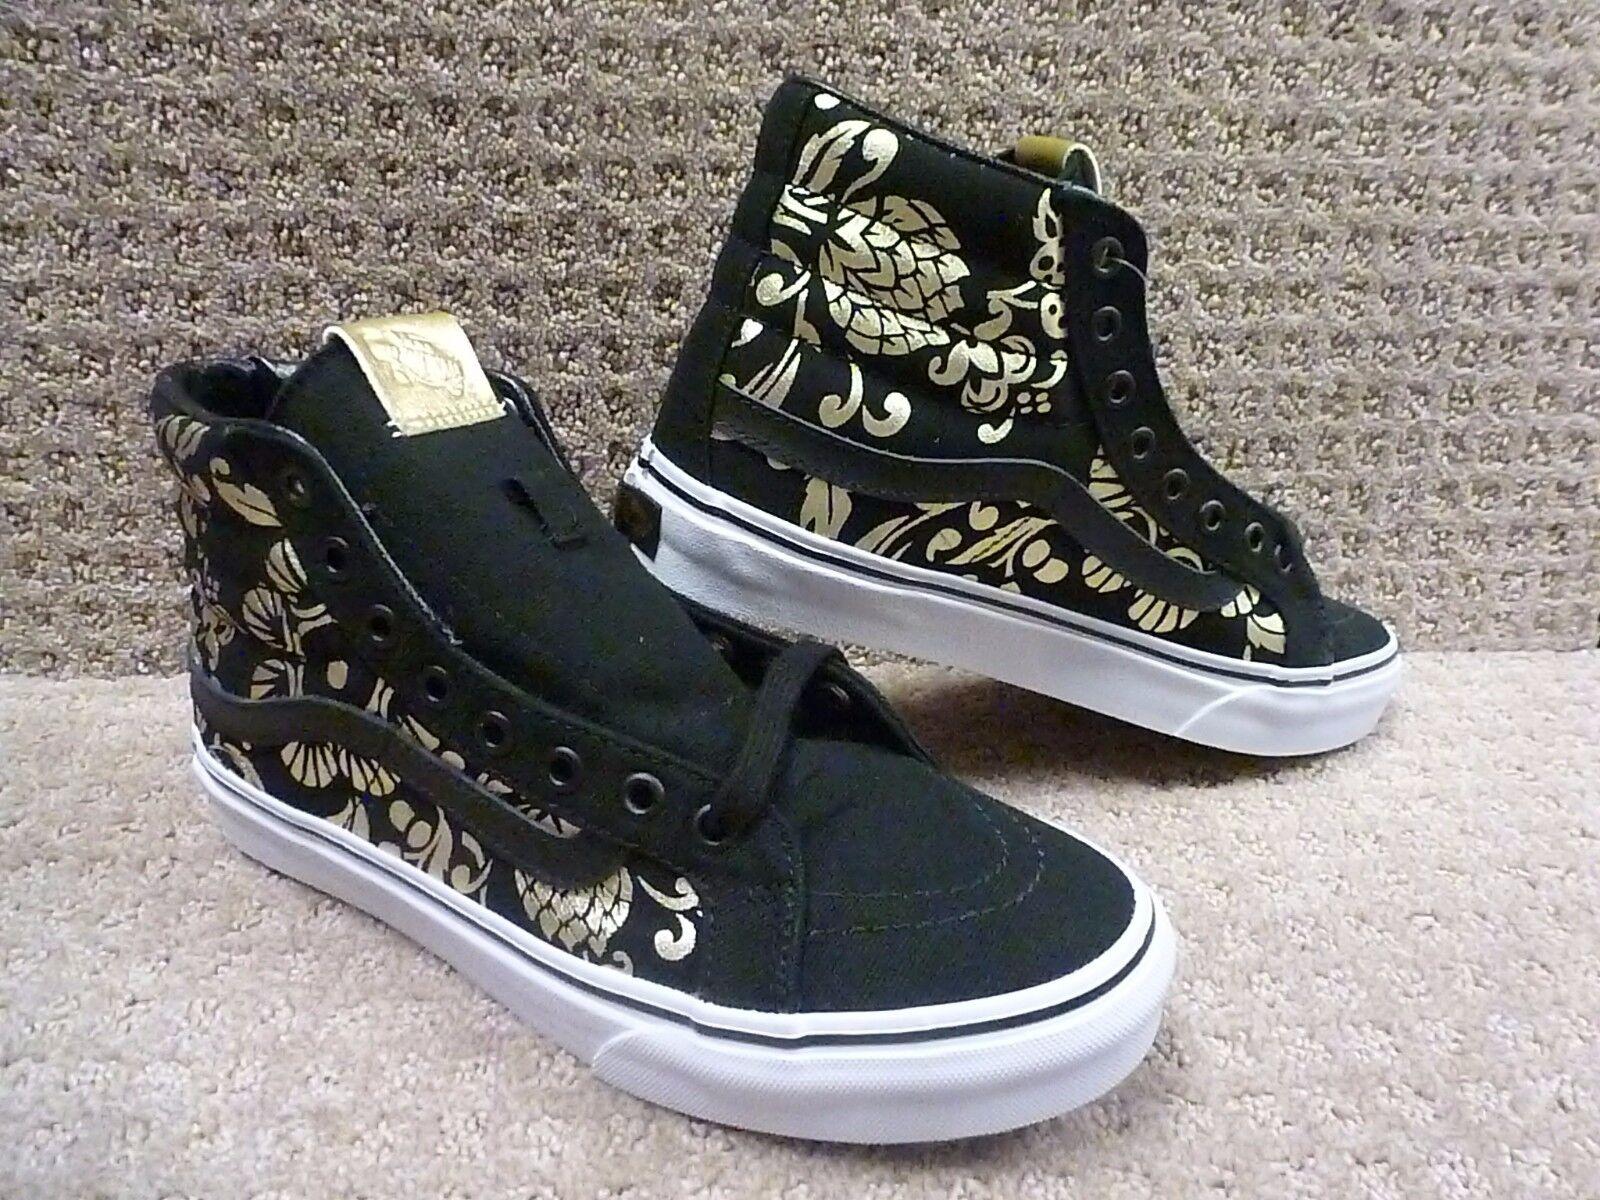 Vans Men's shoes  Sk8-hi Slim  (50th) Duke Blk gold Foil